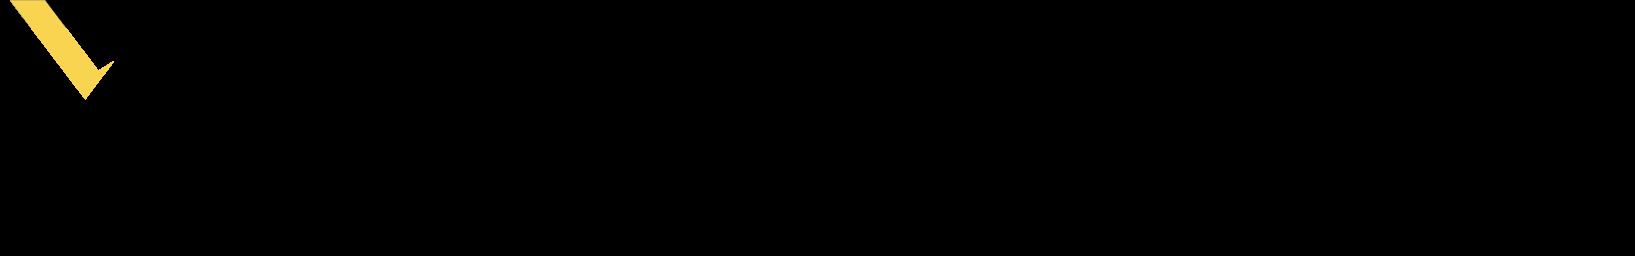 logo baru kartel digital